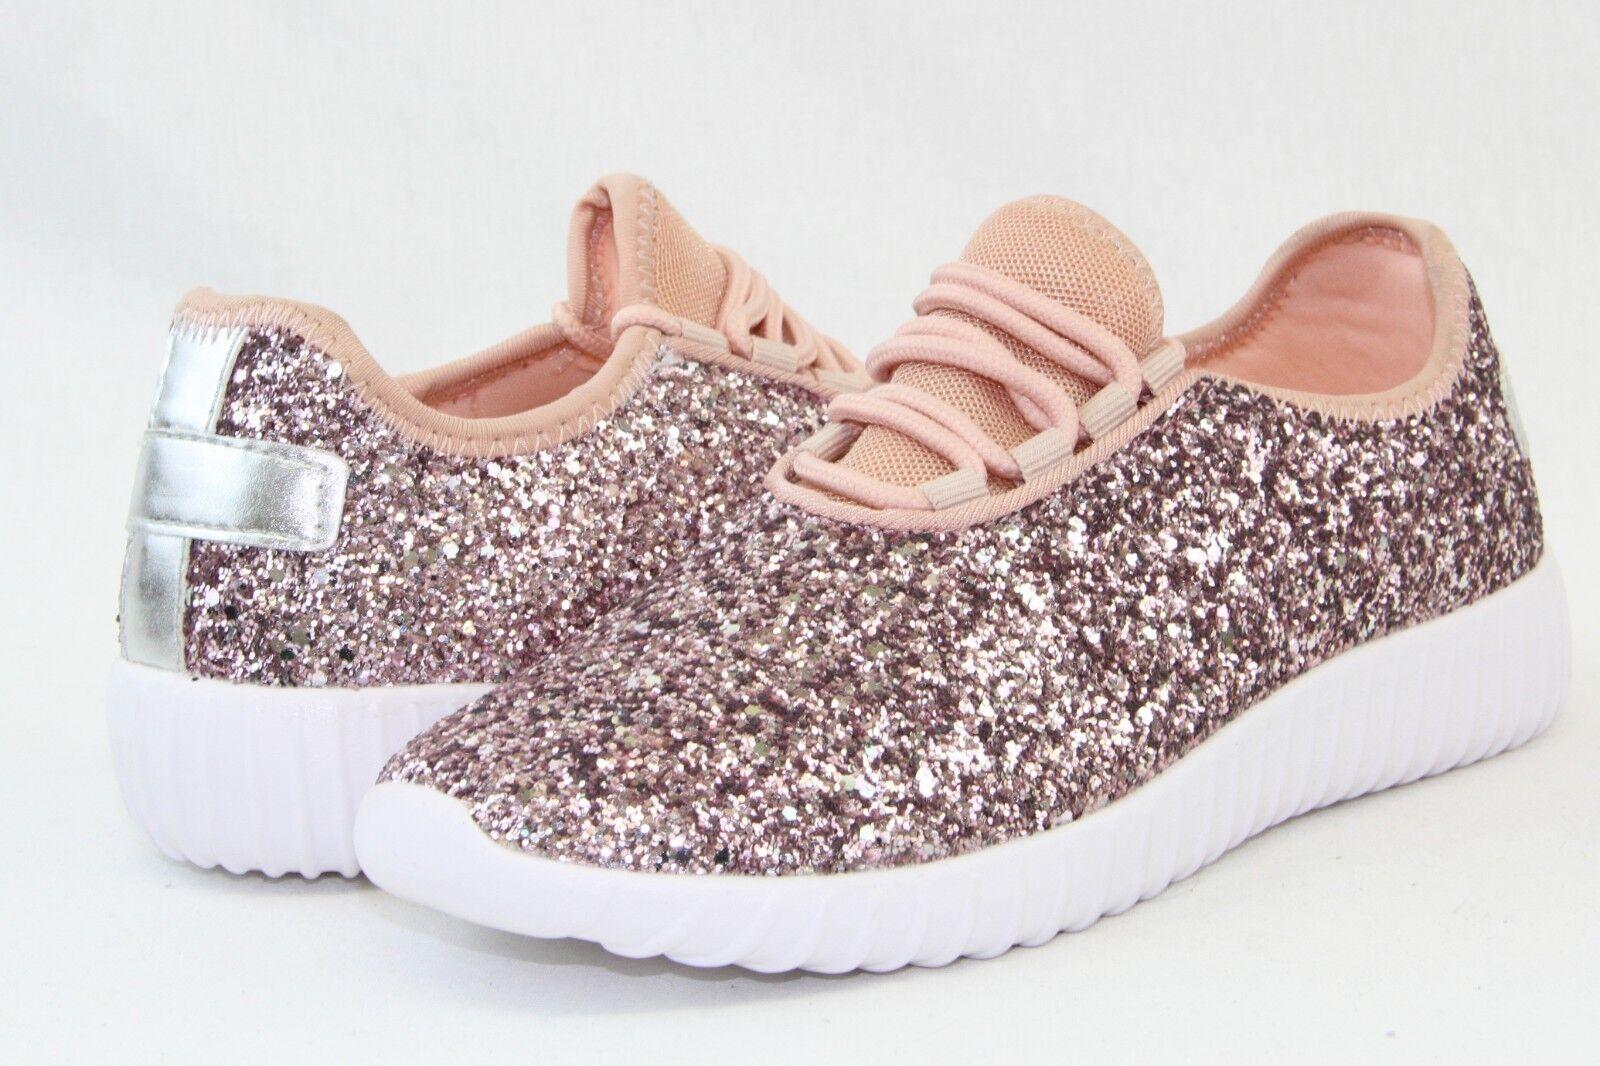 Women Sequin Glitter Sneakers Tennis Lightweight Comfort Walking Athletic Shoes